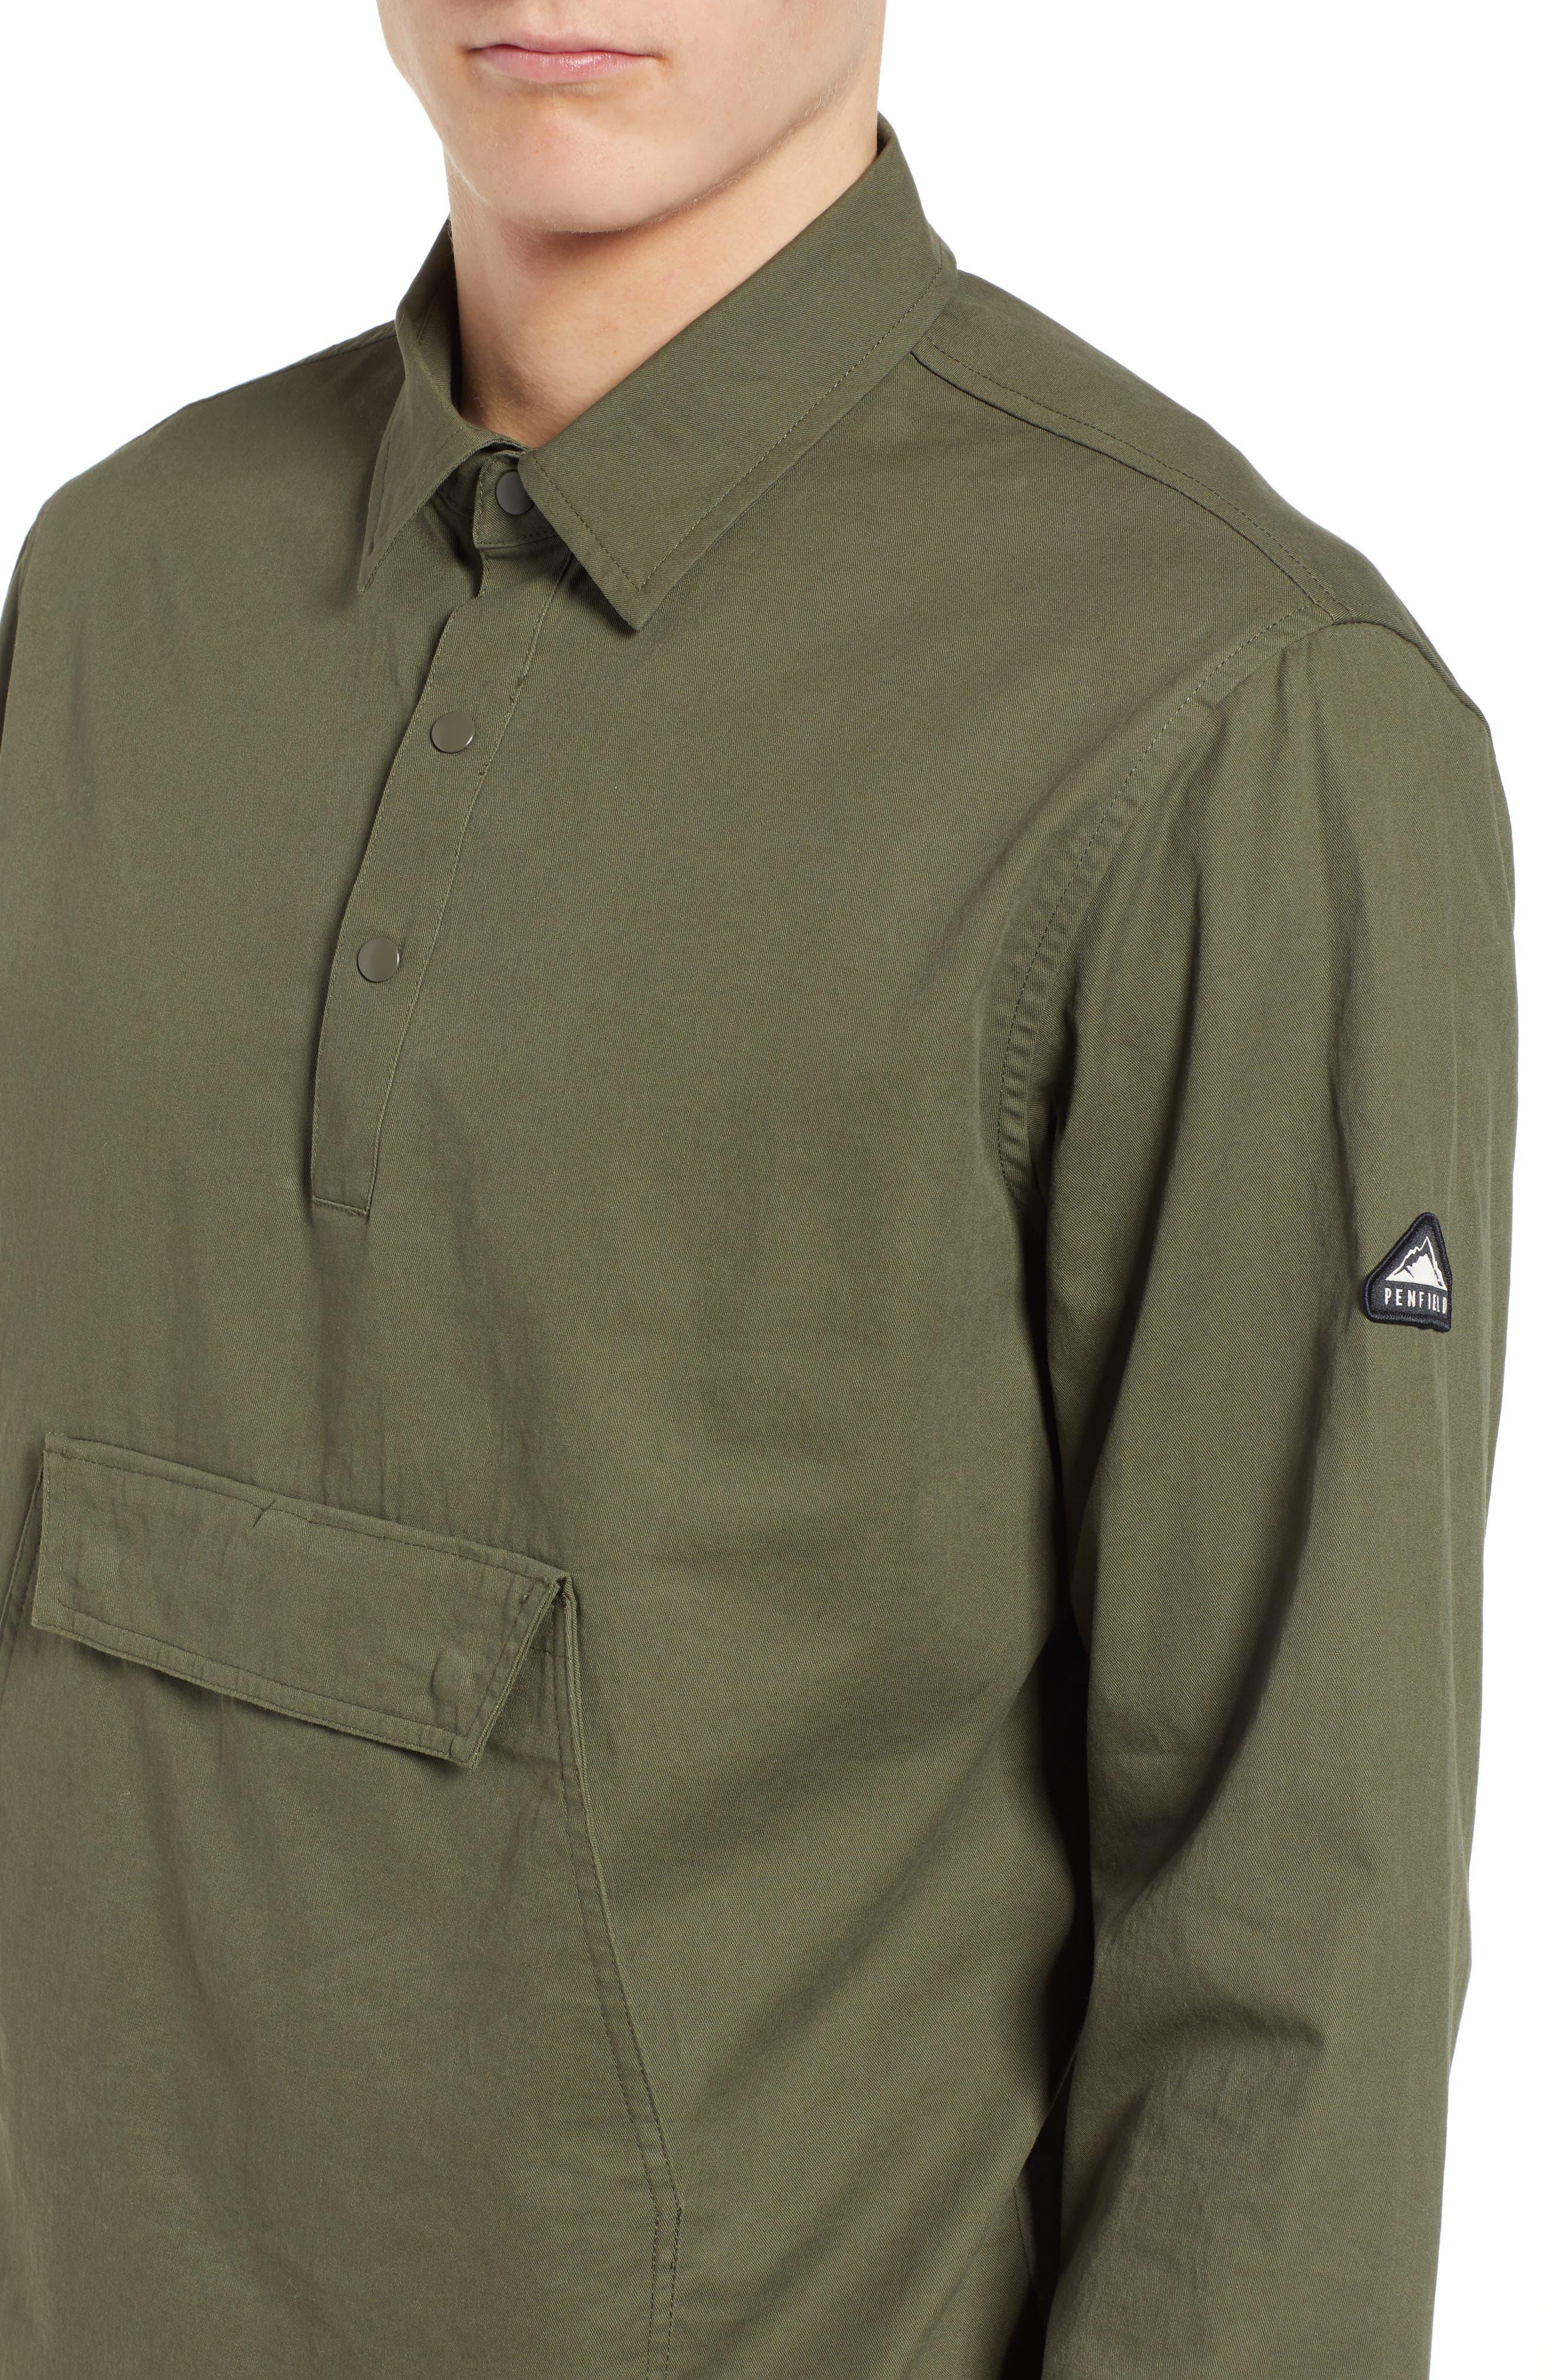 Adelanto Snap Pocket Shirt,                             Alternate thumbnail 4, color,                             DARK OLIVE